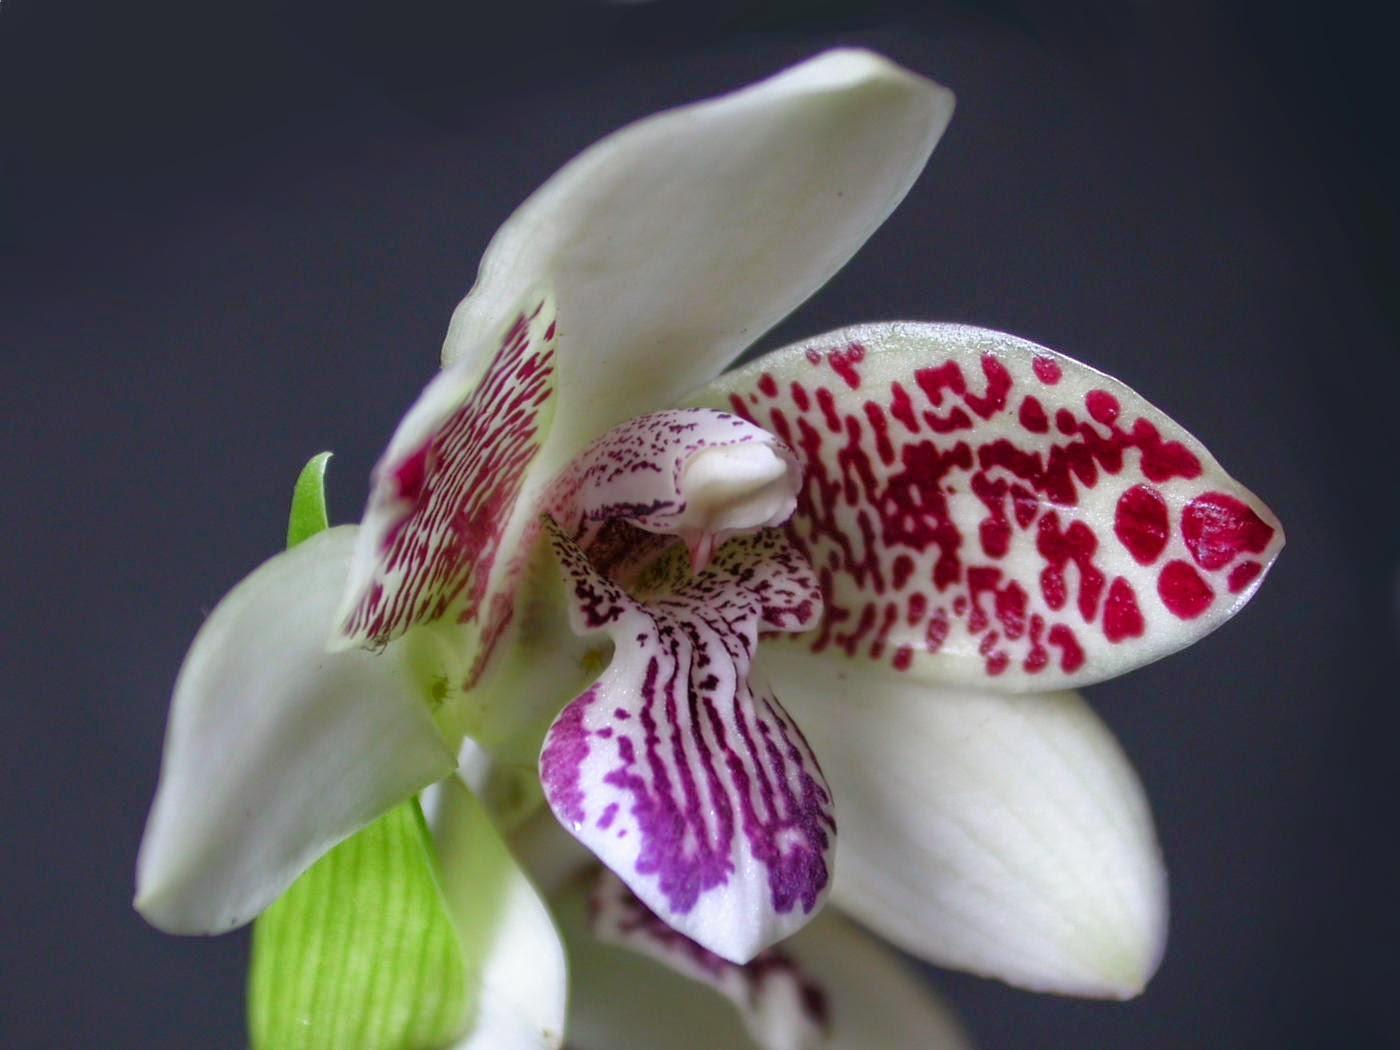 Espécies de orquídeas raras e exóticas no Brasil